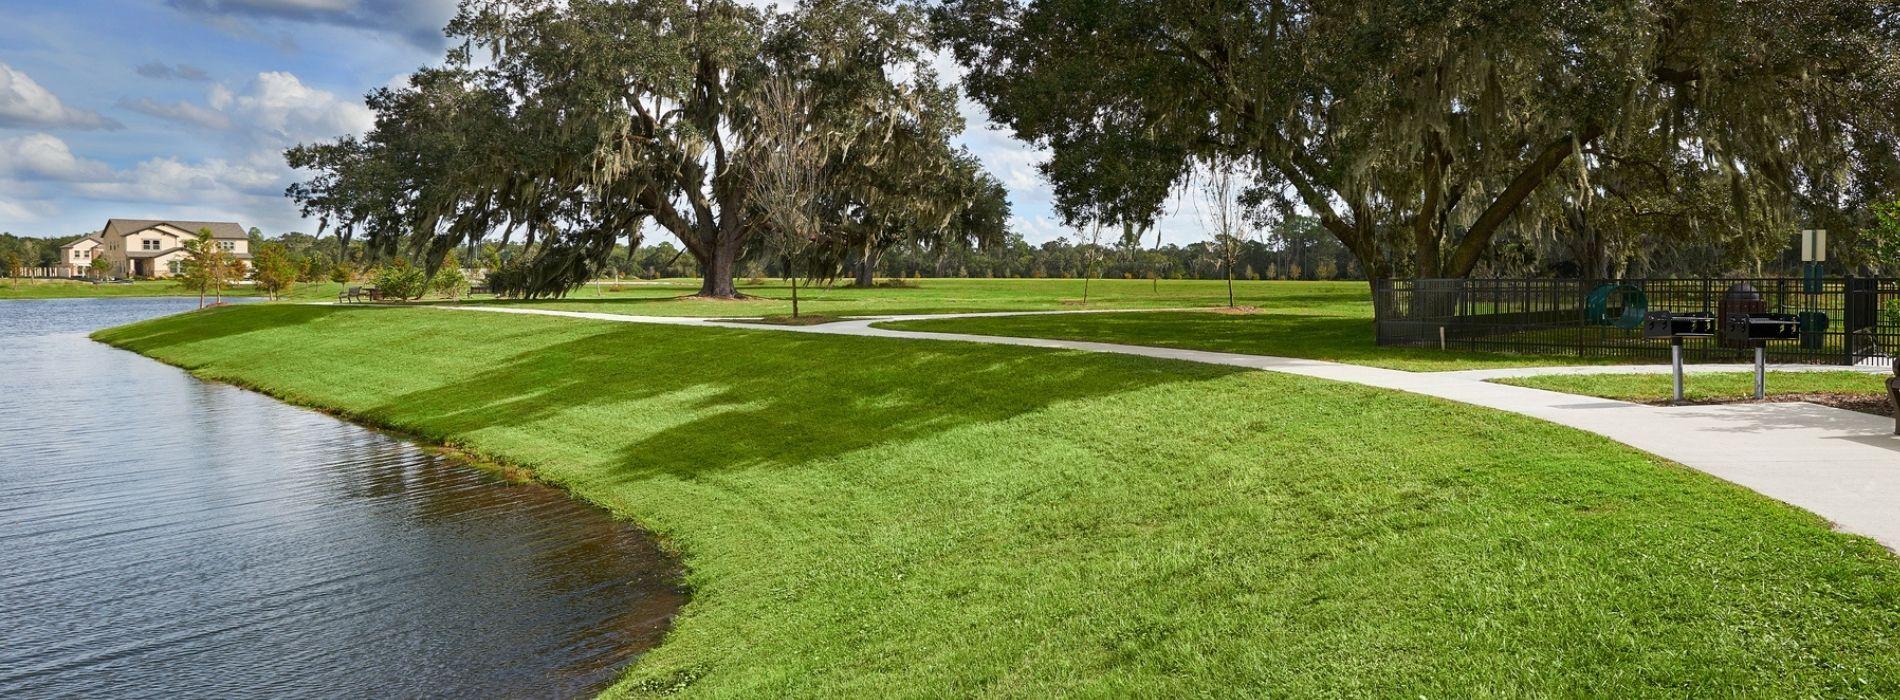 Sod Installation in Orlando